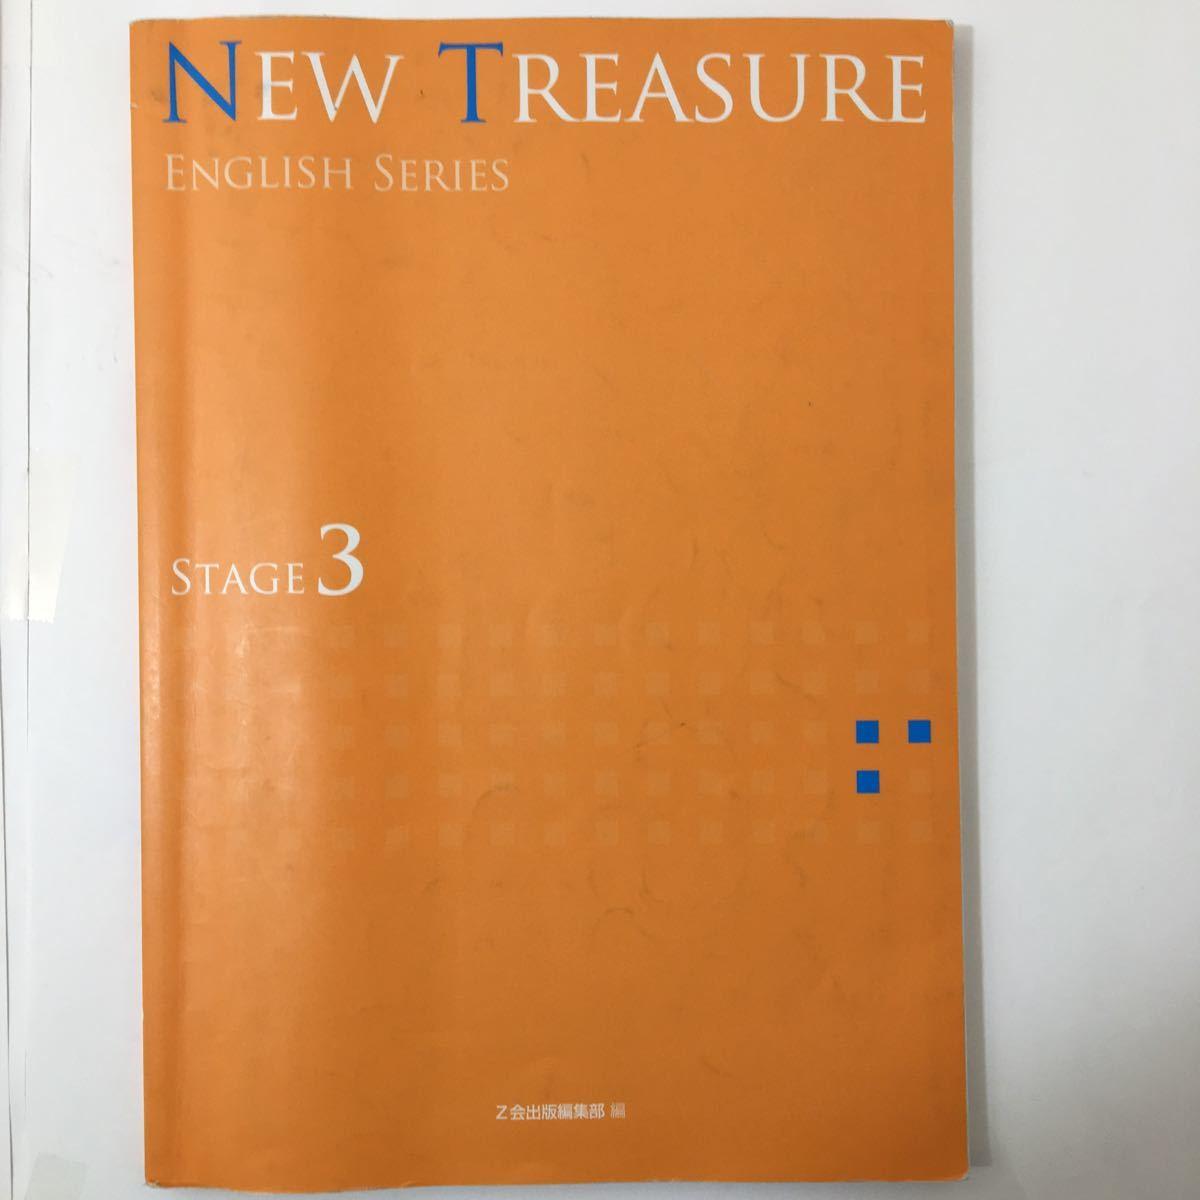 ♪NEW TREASURE ENGLISH SERIES STAGE3 Z会出版編集部 (編集) 学校 2015 単行本 z-52